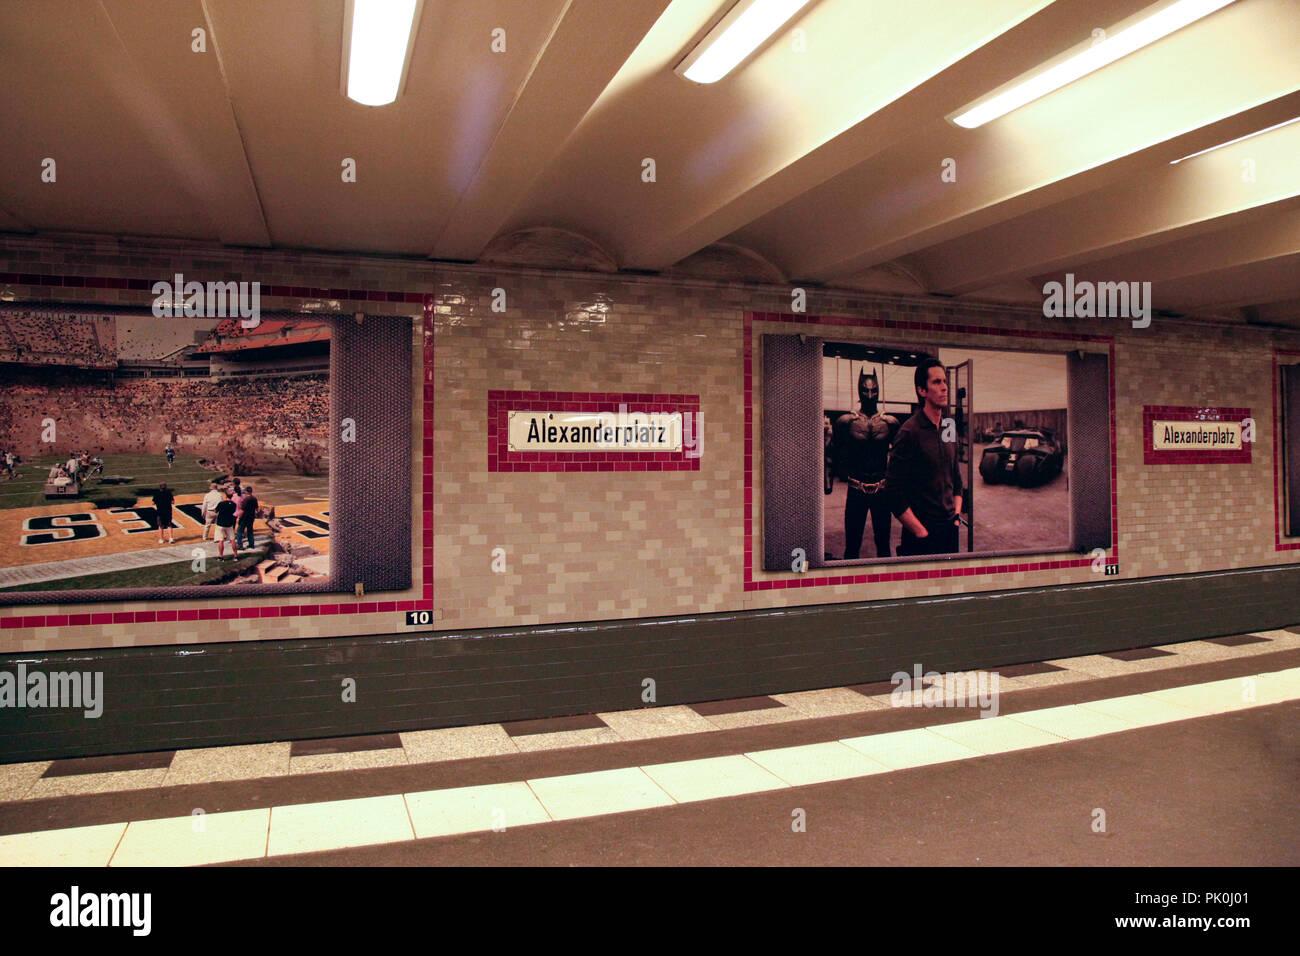 Alexanderplatz underground station in Berlin, Germany - Stock Image